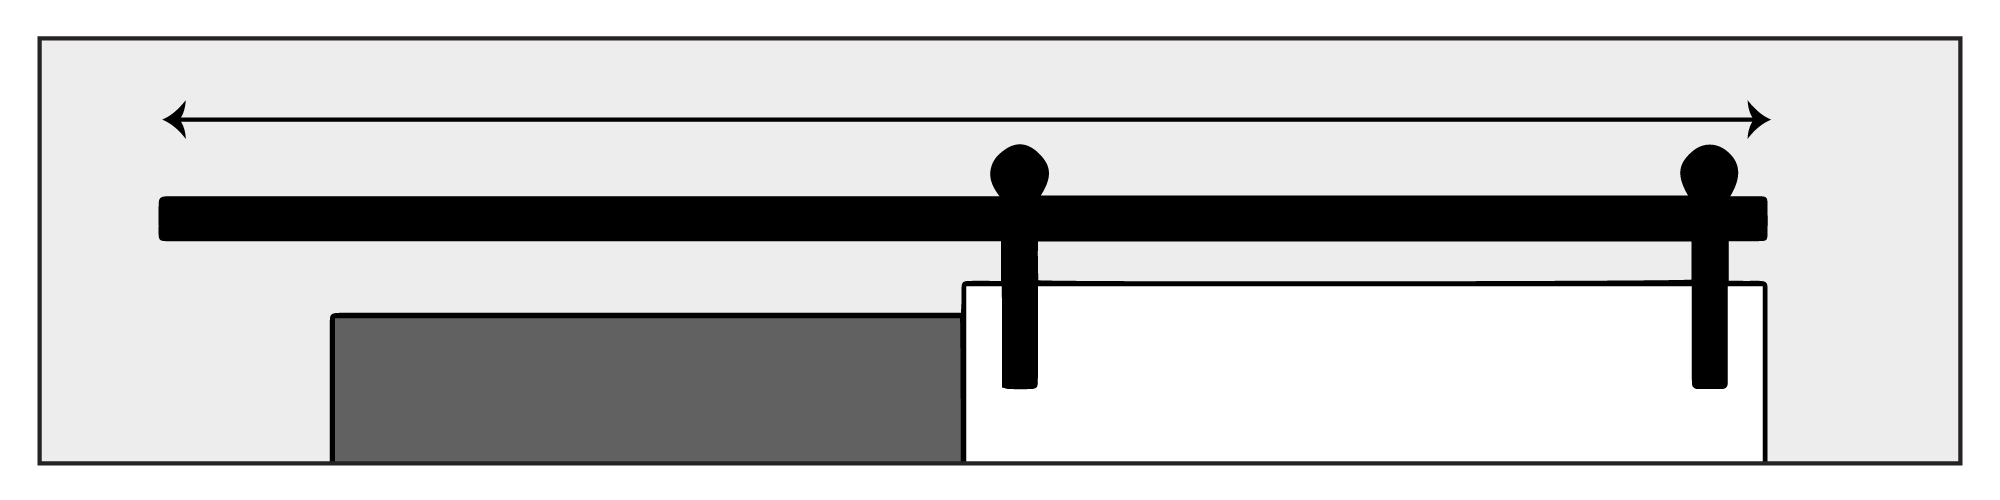 Sliding Door Rail Size Illustration